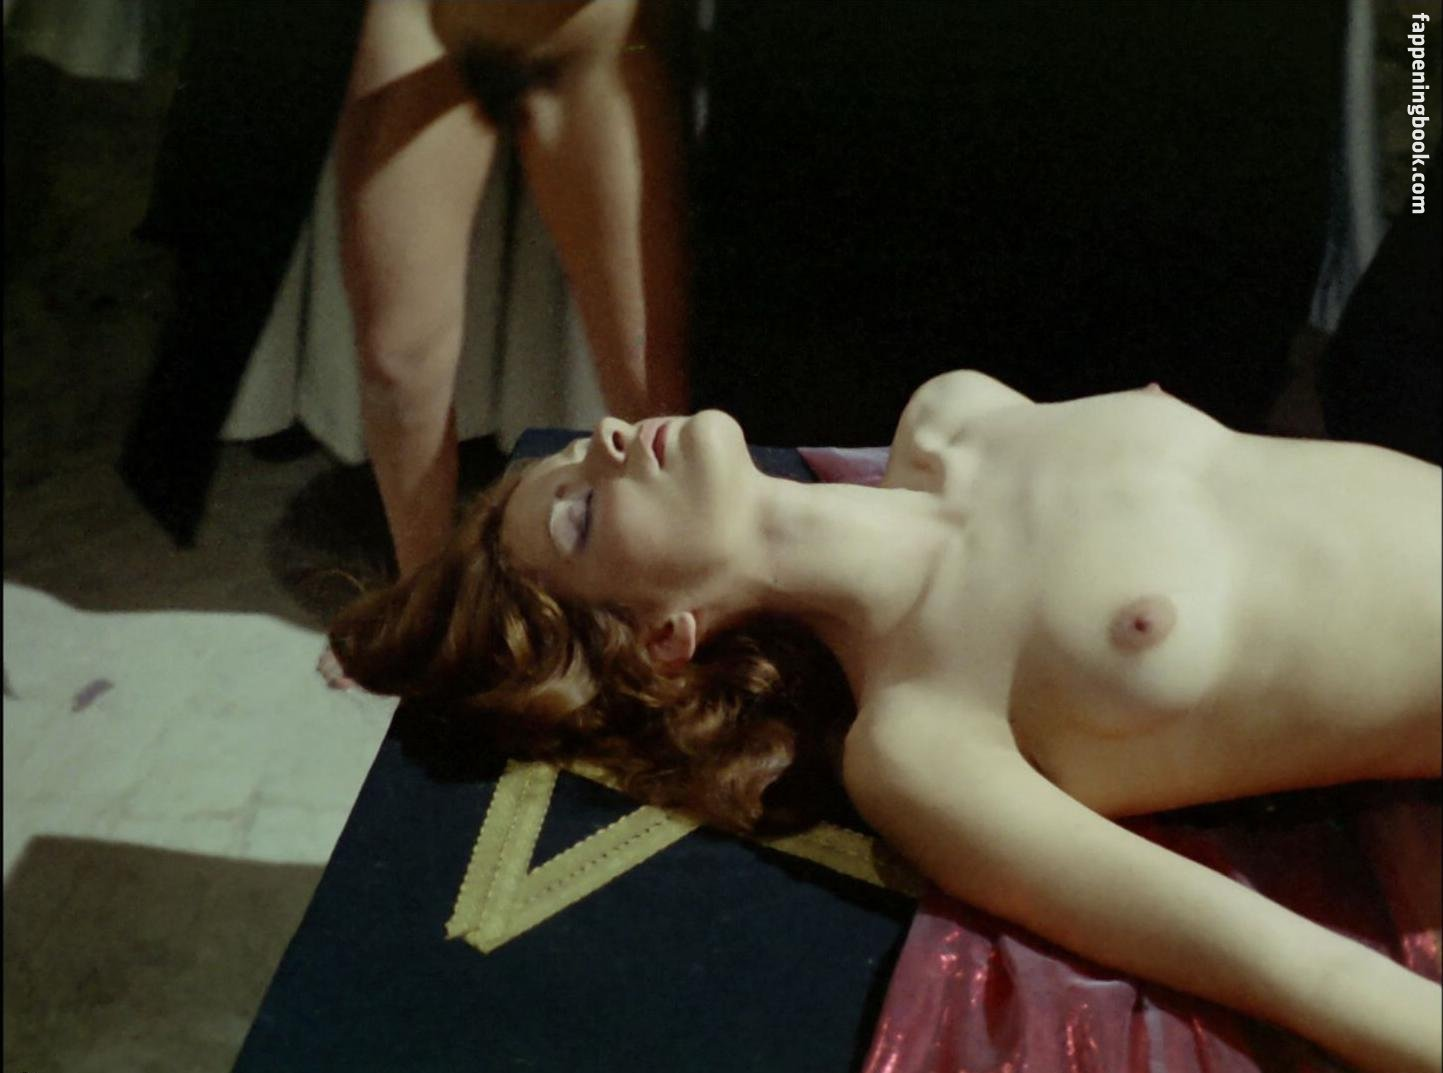 Ana Walczak Nude grace mills nude, sexy, the fappening, uncensored - photo